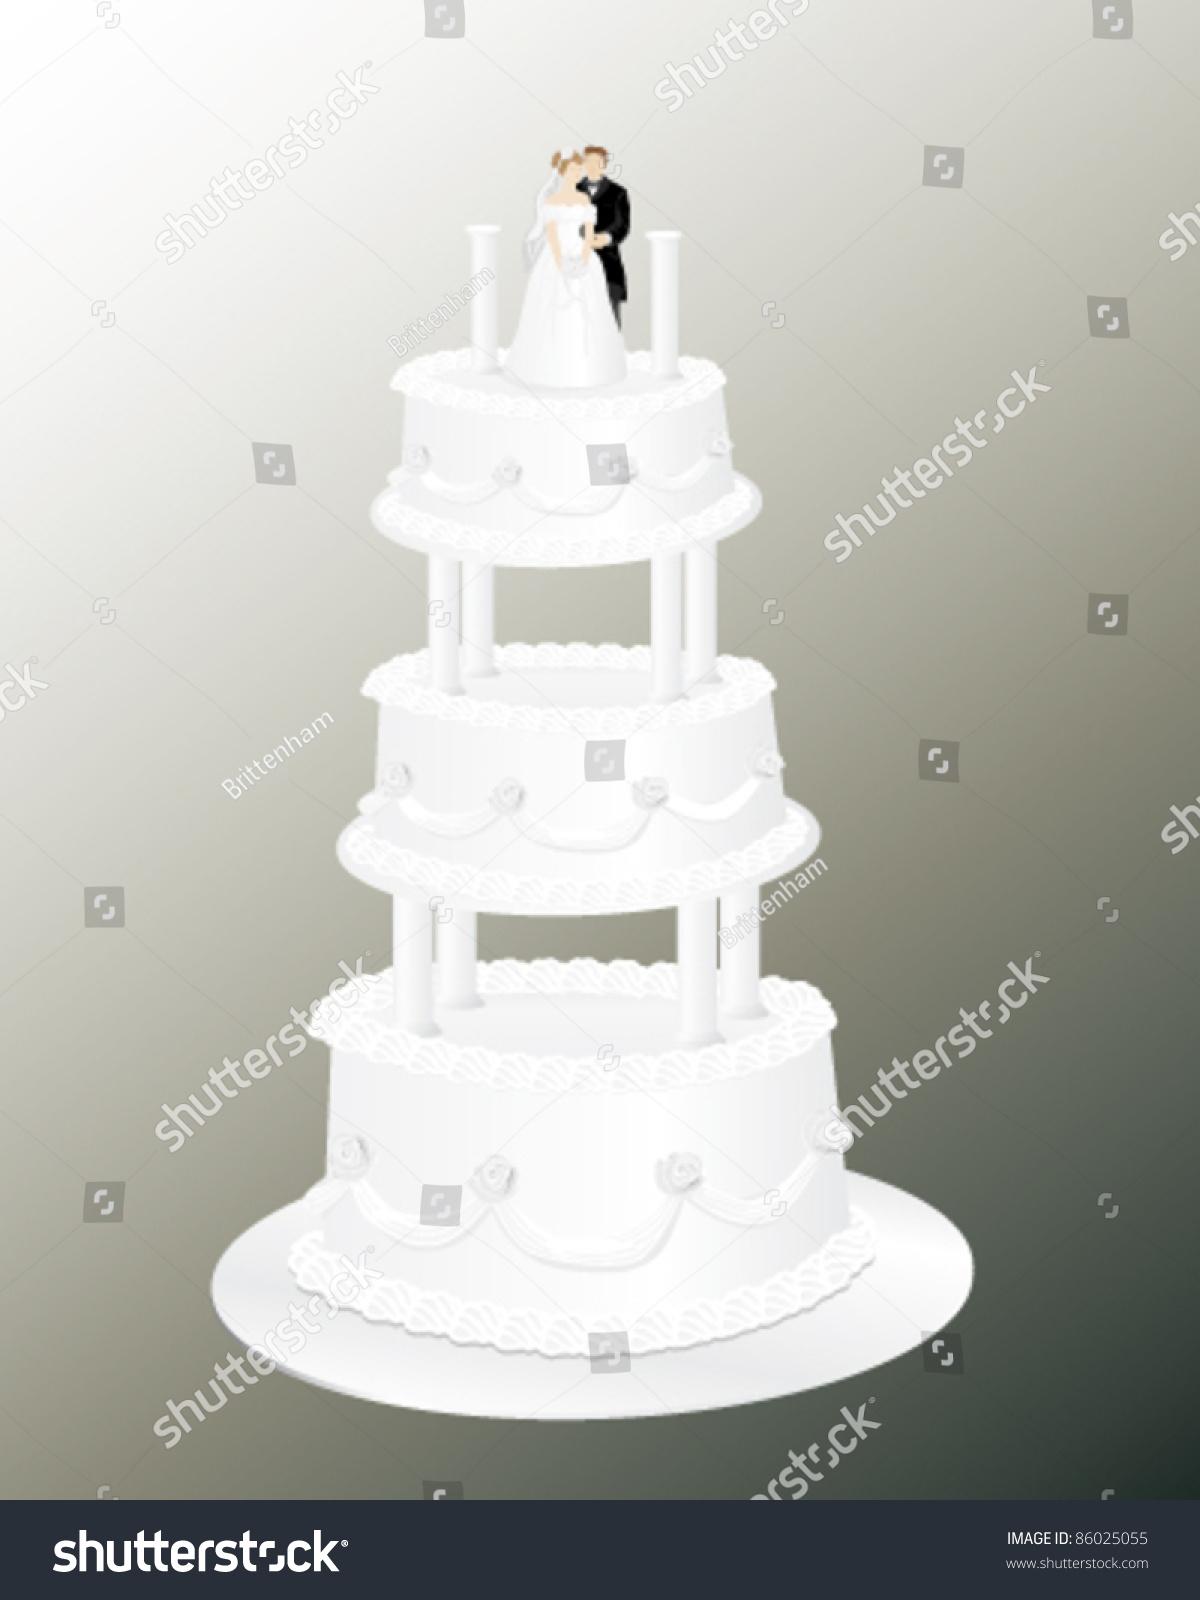 Beautiful Wedding Cake That Has Loving Stock Vector HD (Royalty Free ...